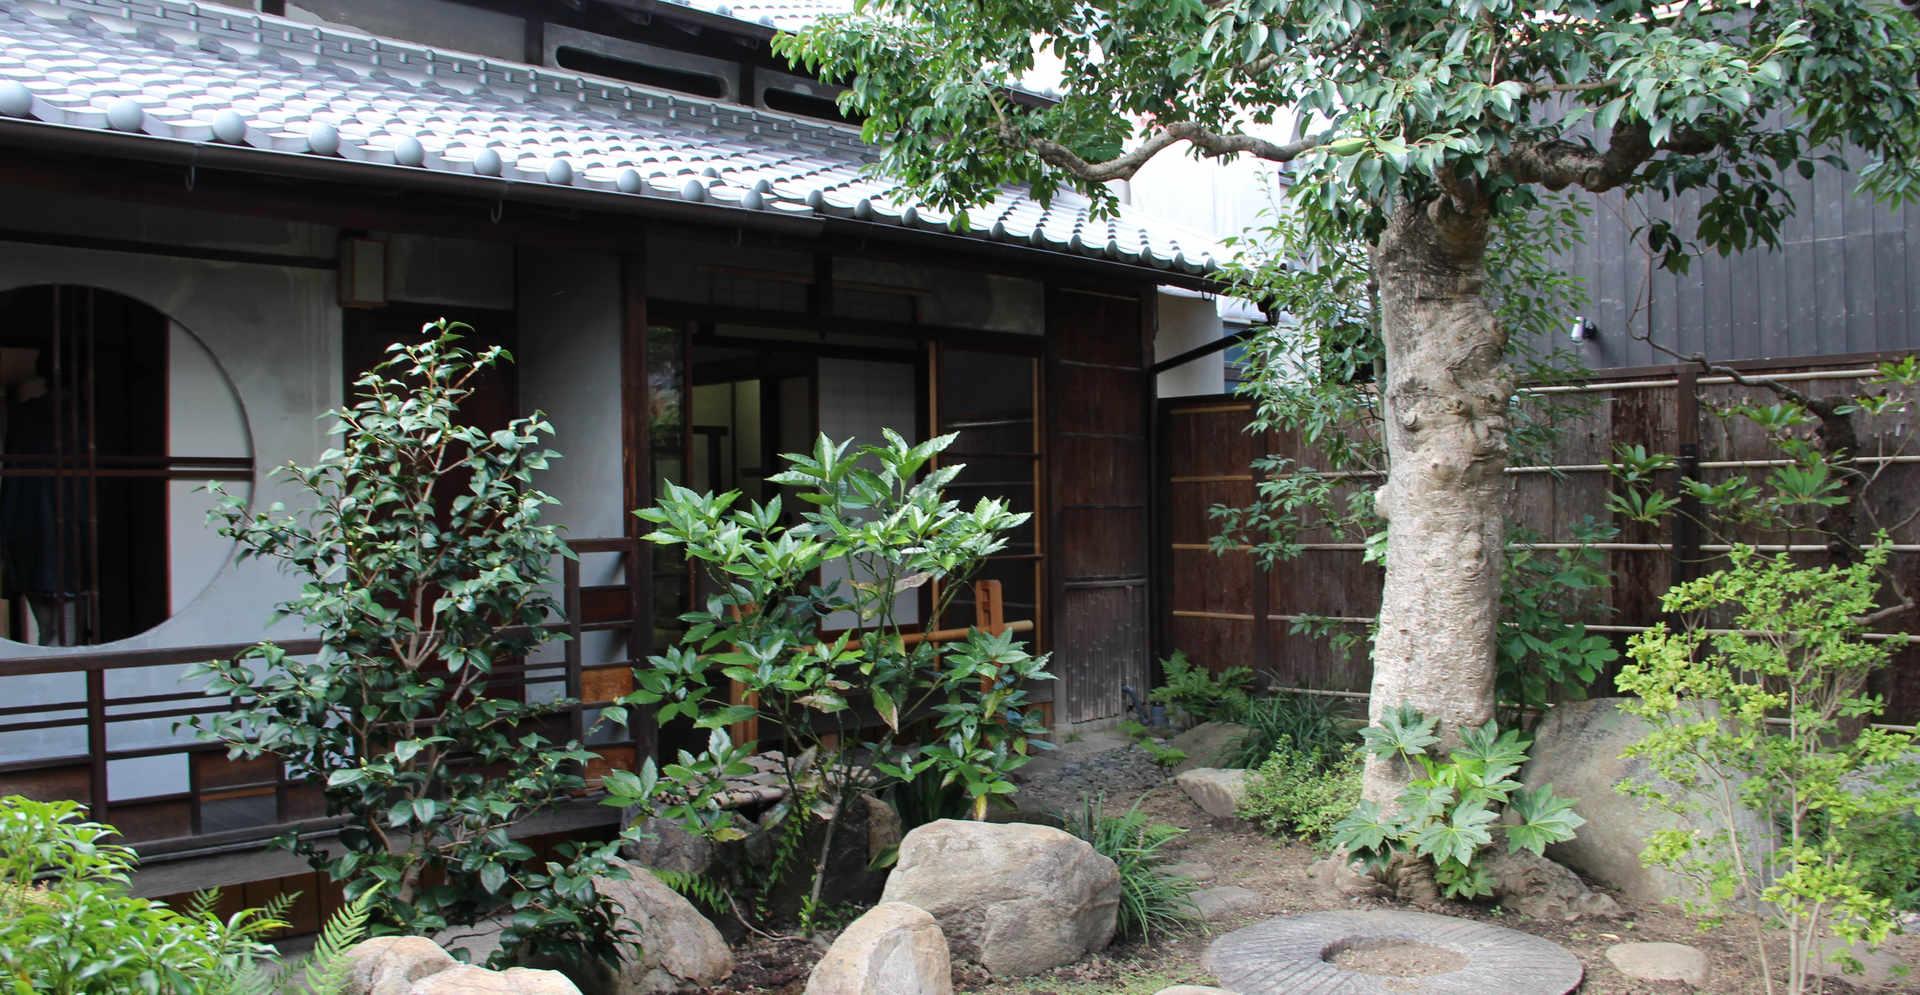 Naramachi Nigiwai-no-ie /奈良町傳統住宅